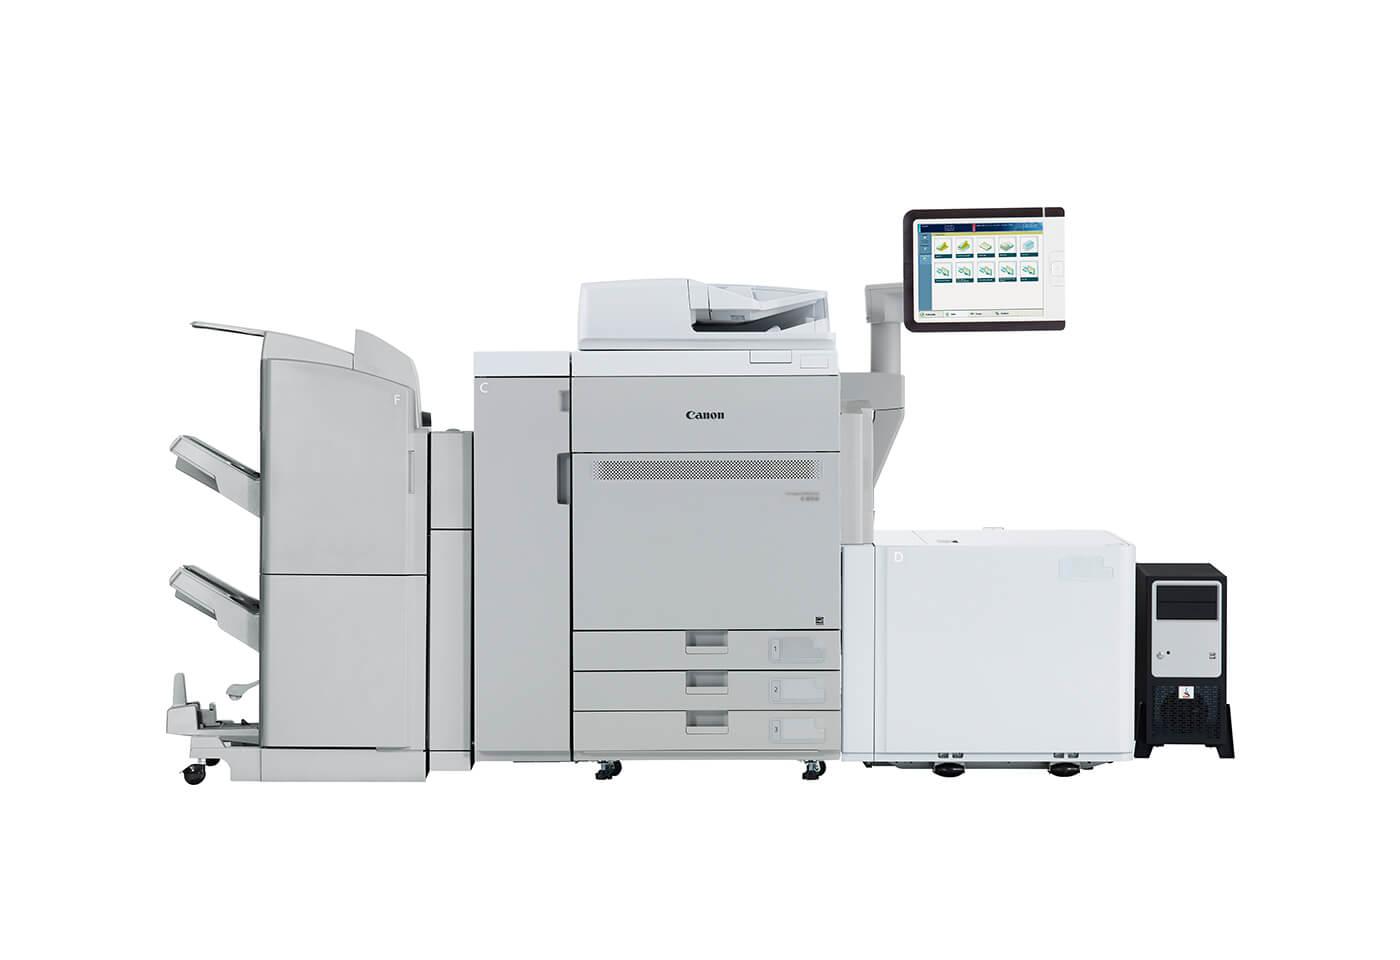 imagePRESS C650 image